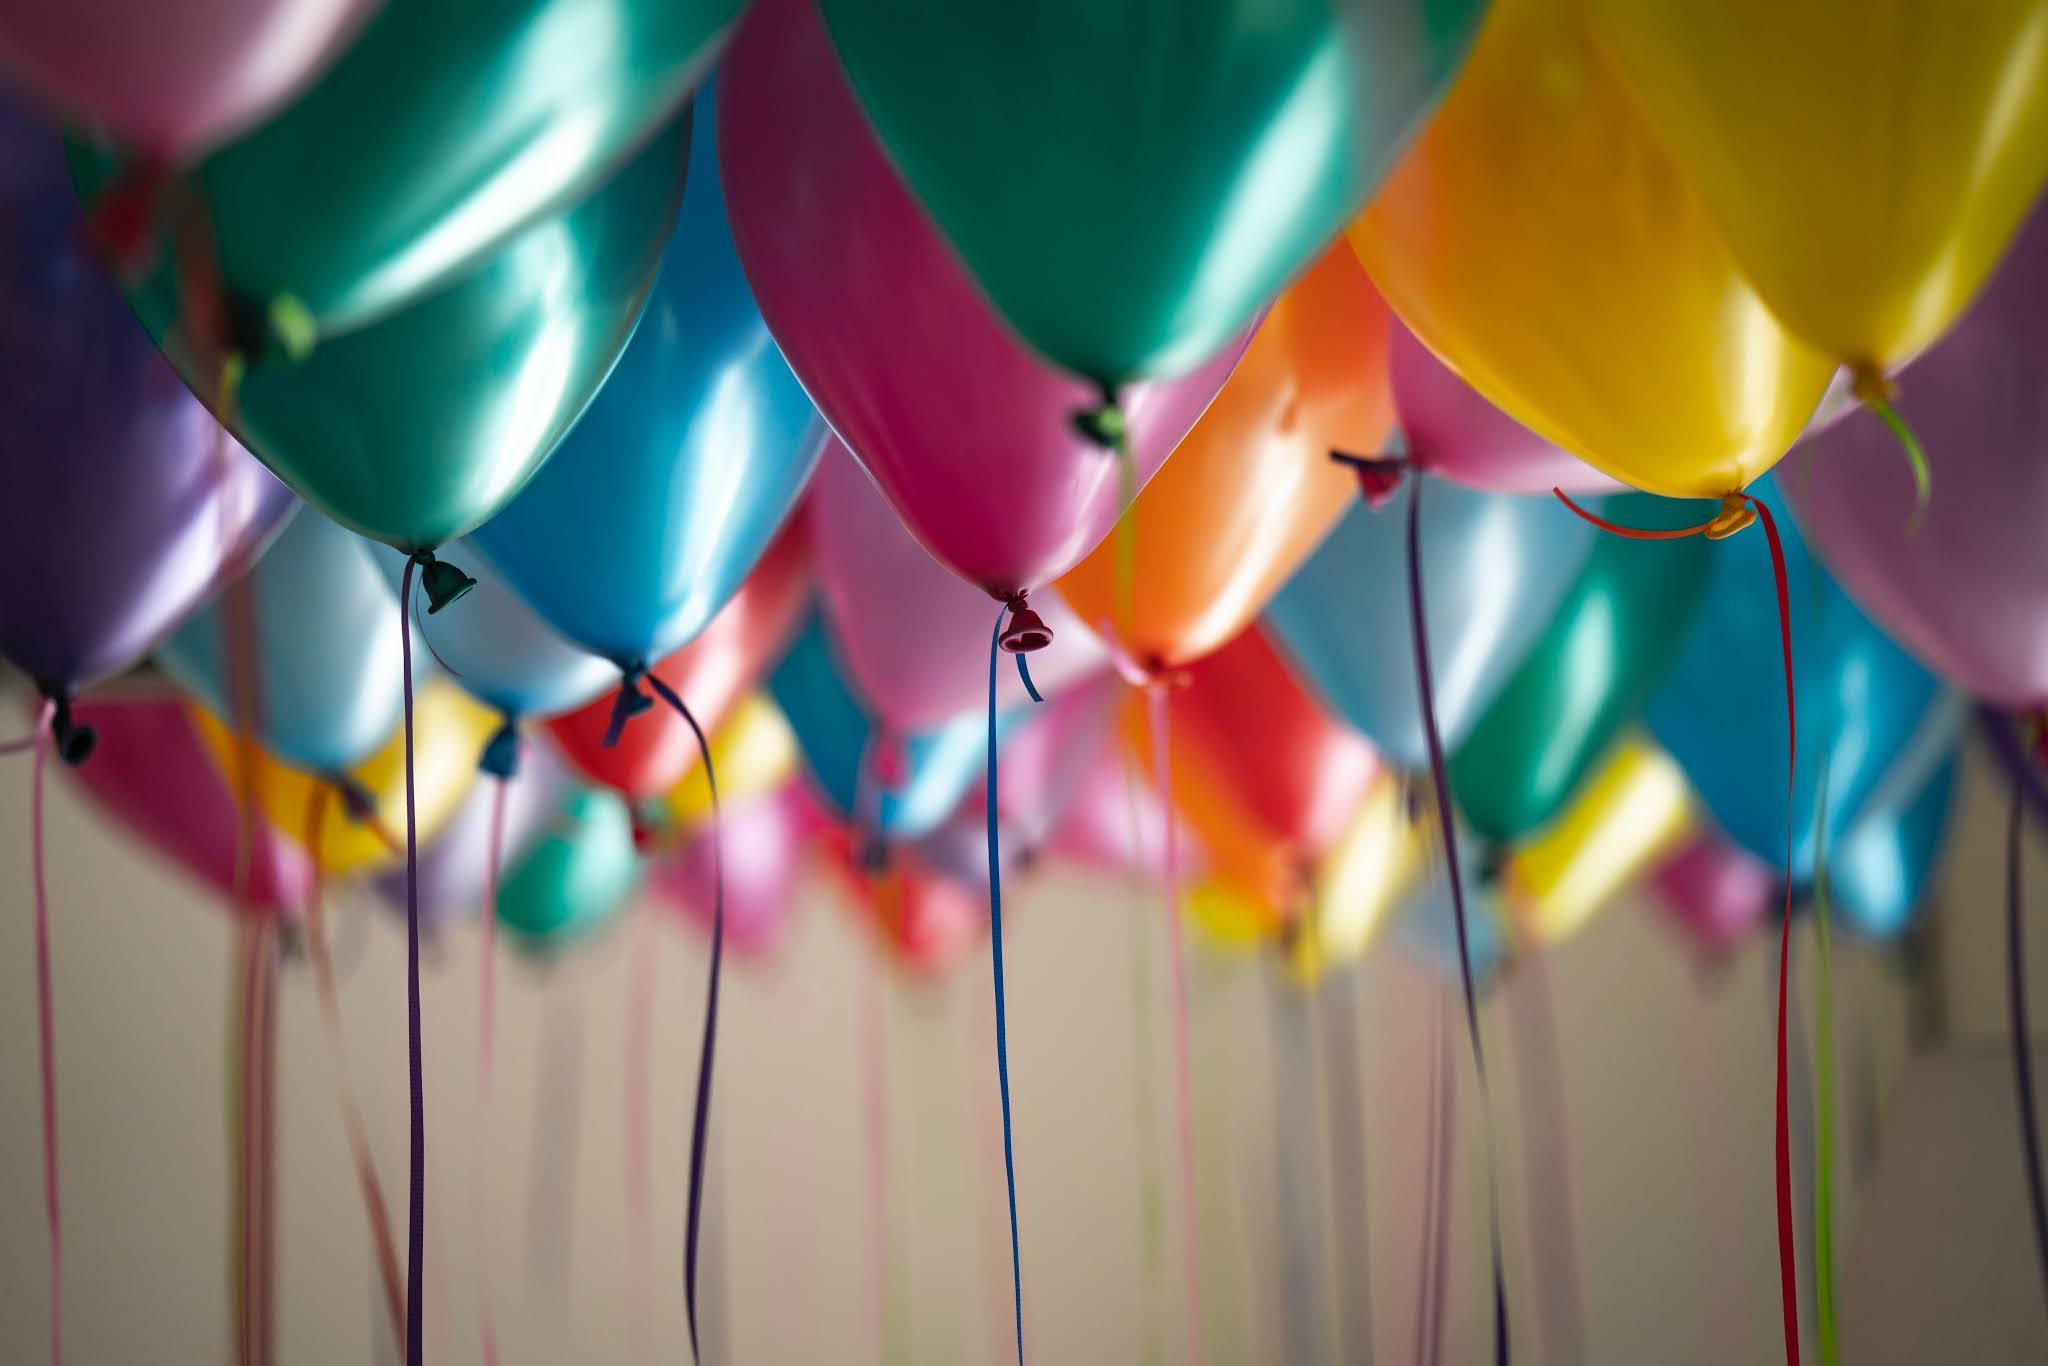 Photo by Adi Goldsteinon Unsplash Image CCO OF LOTS OF Helium balloons